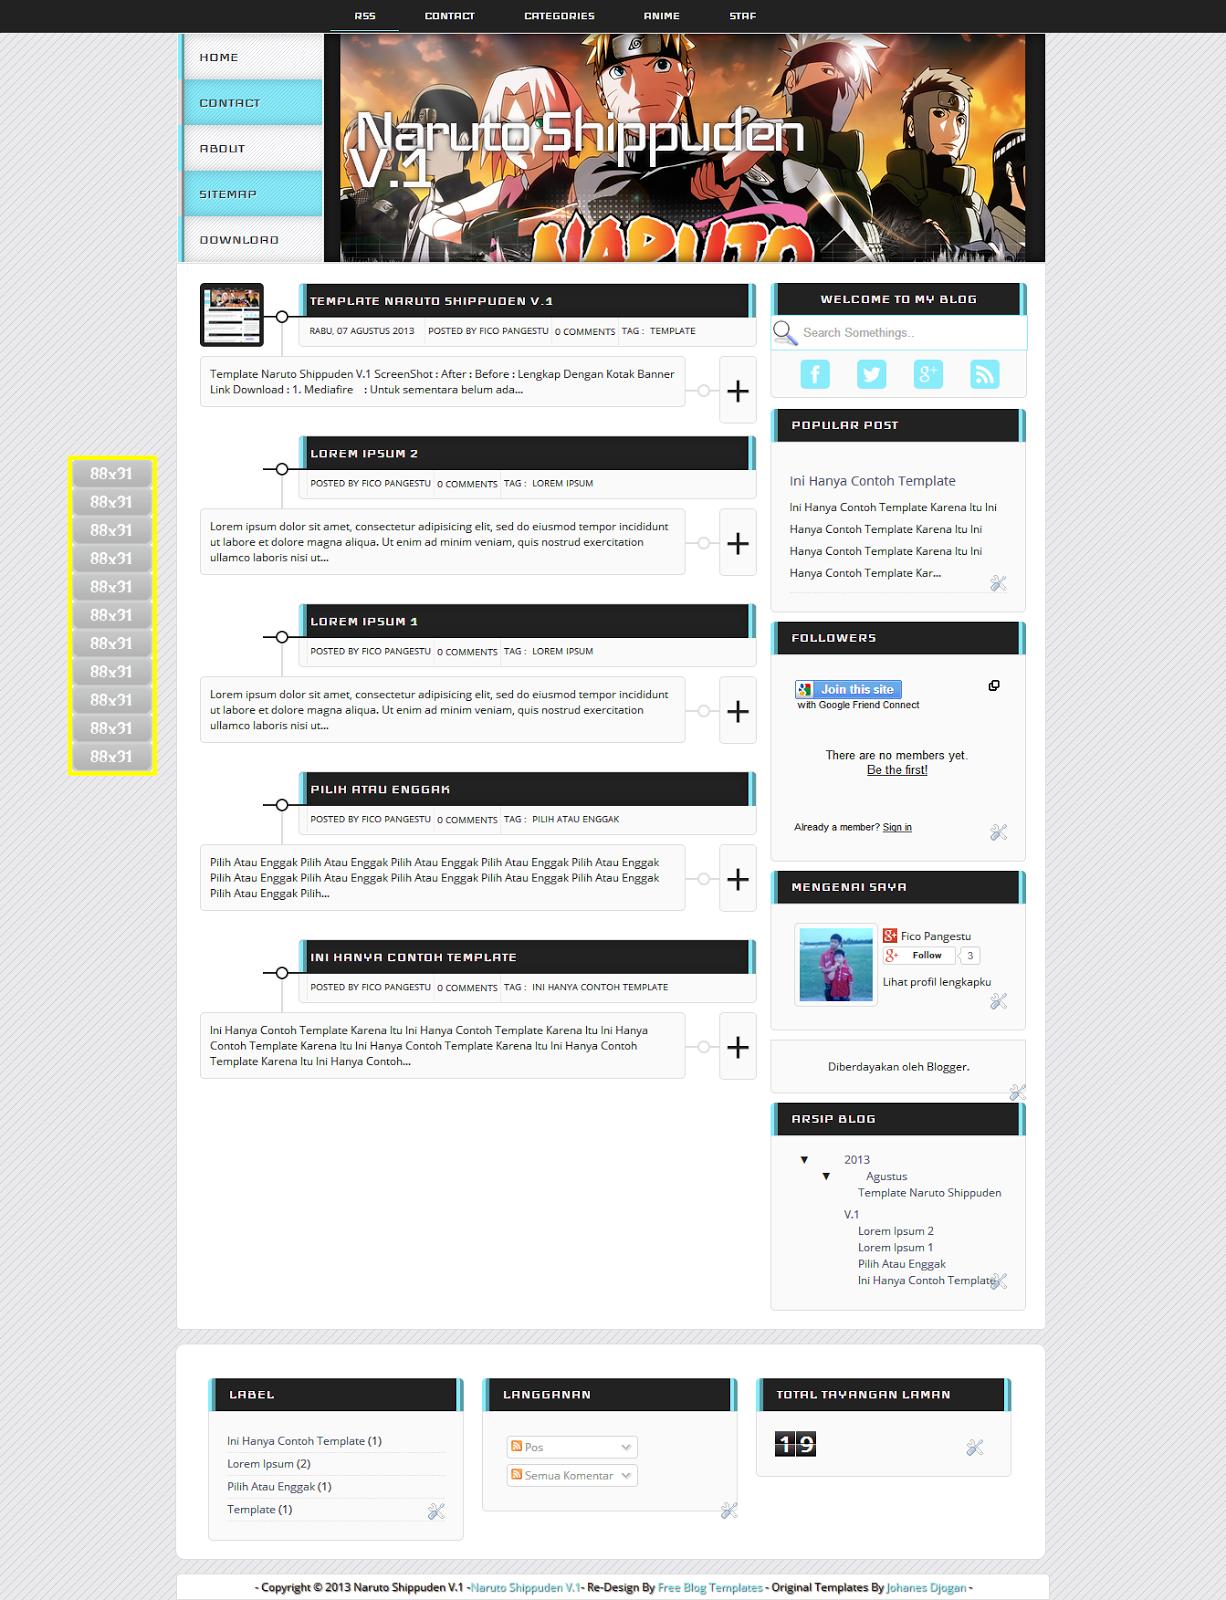 Download Template : Naruto Shippuden V.1 | OPEN SHARE TEMPLATE